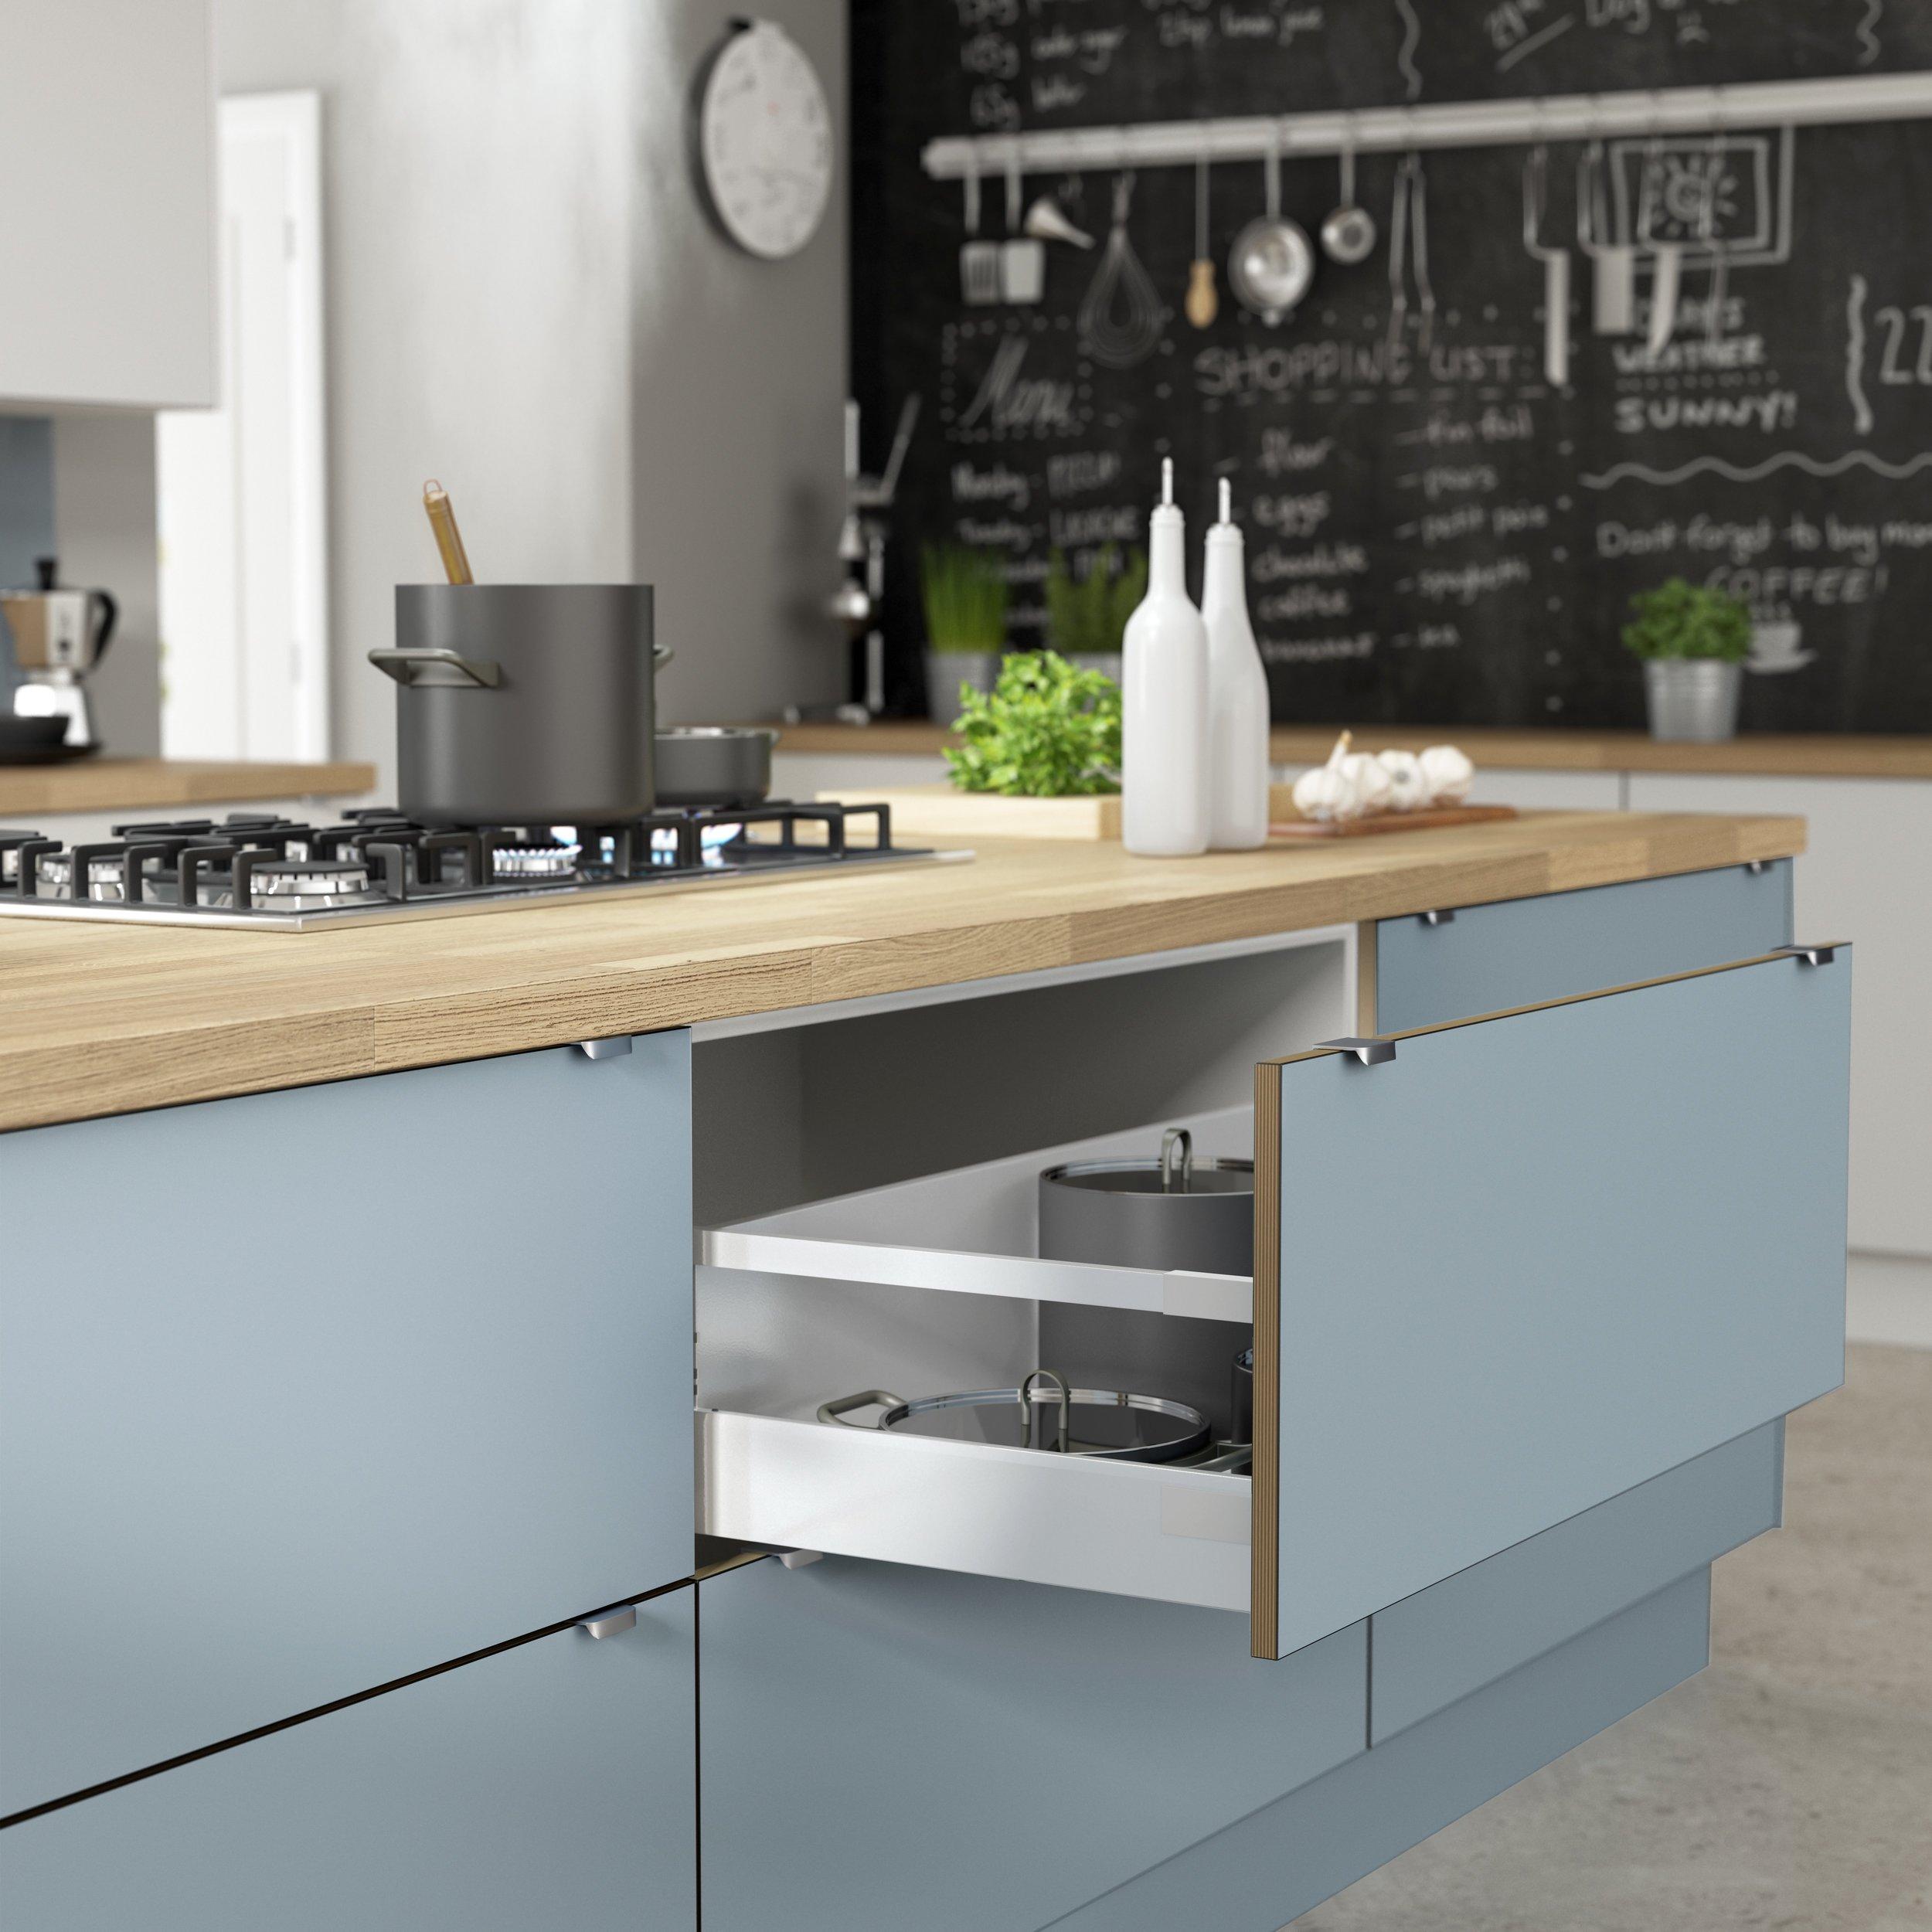 Kitchens_GADDESBY_Sodermalm_Denim_Cameo.jpg